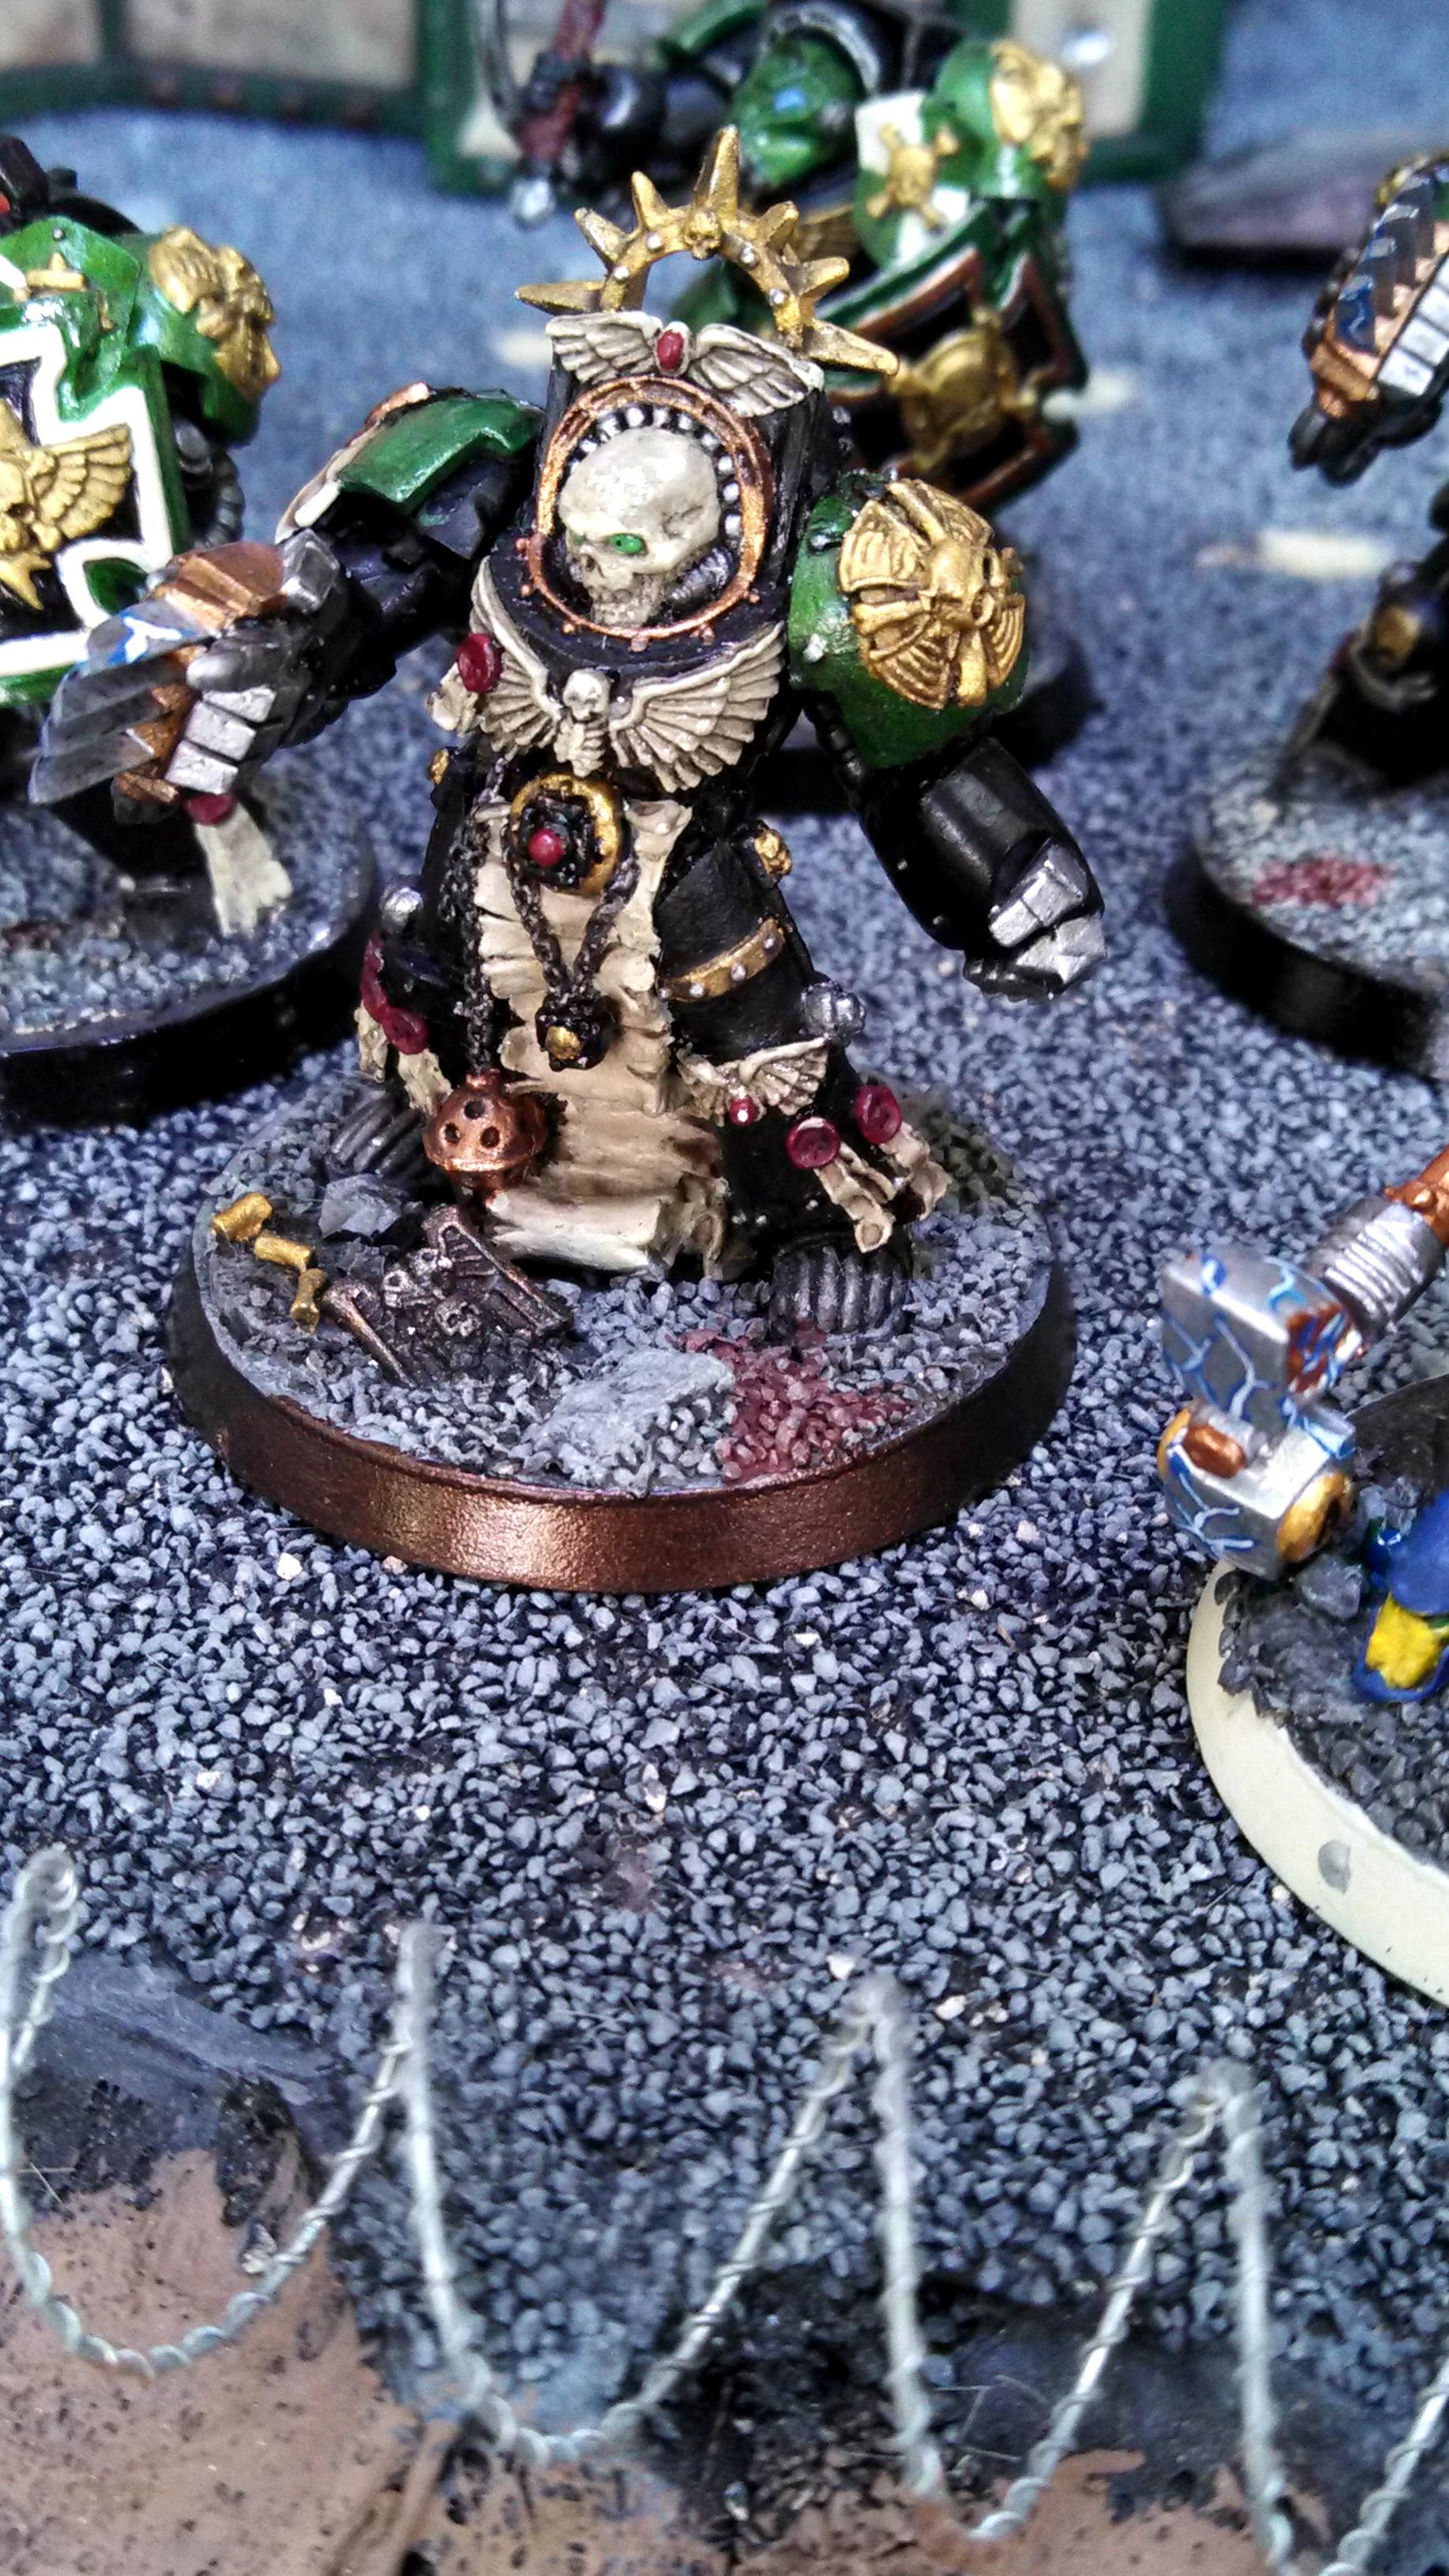 Aegis Line, Black Templars, Display Board, Dreadnought, Drop Pod, Honoured Imperium, Ironclad, Scout Squad, Space Marines, Tactical Squad, Terminator Armor